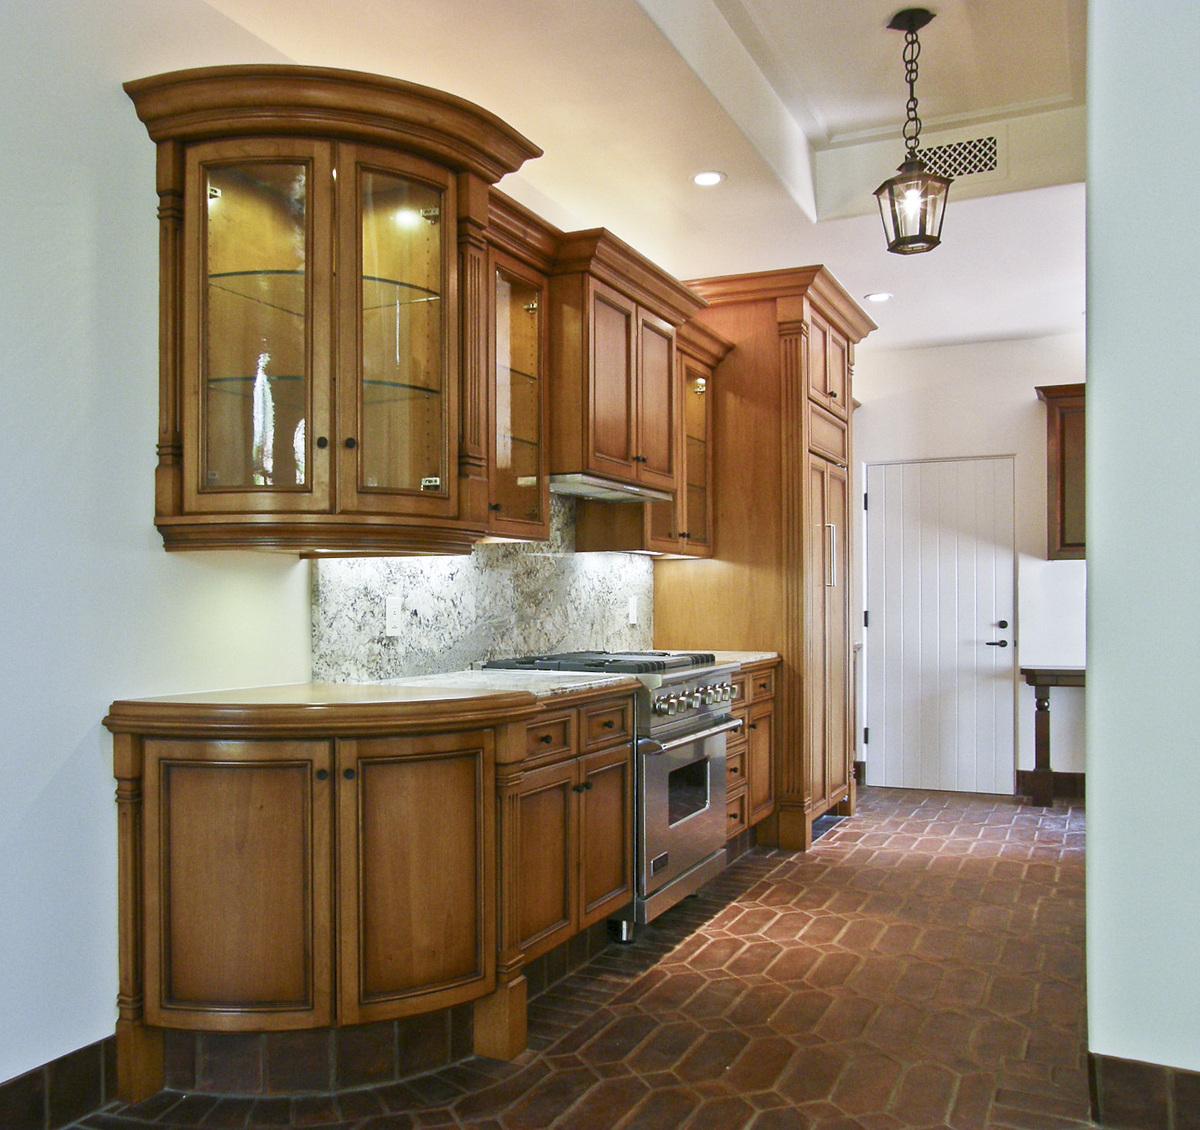 Colonial revival kitchens joy studio design gallery for Colonial revival kitchen design